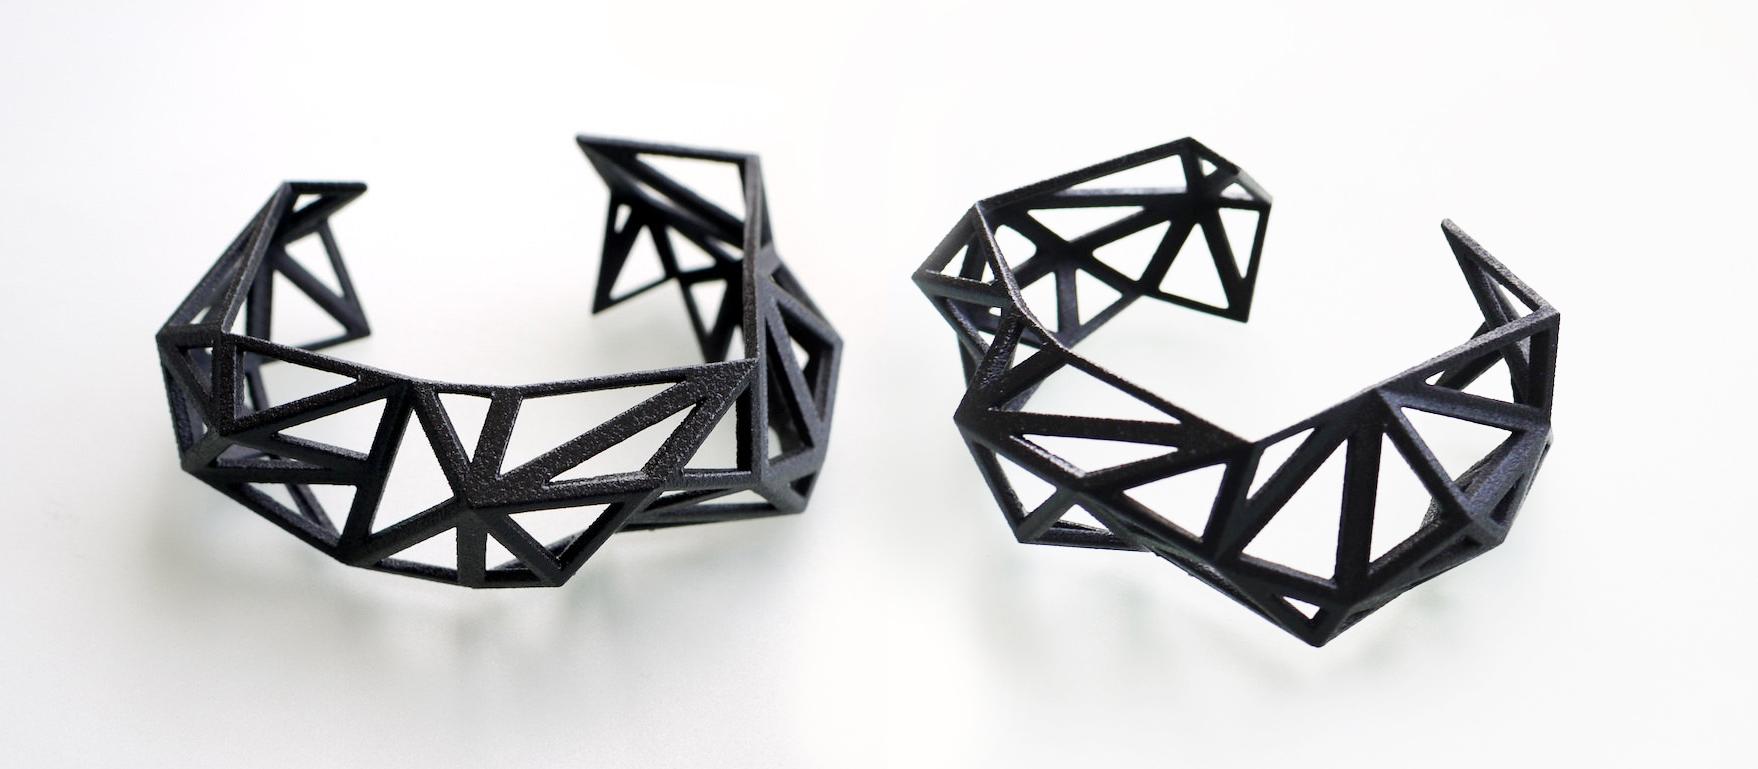 item of the week : Triangulated Cuff Bracelet by Archetype Z